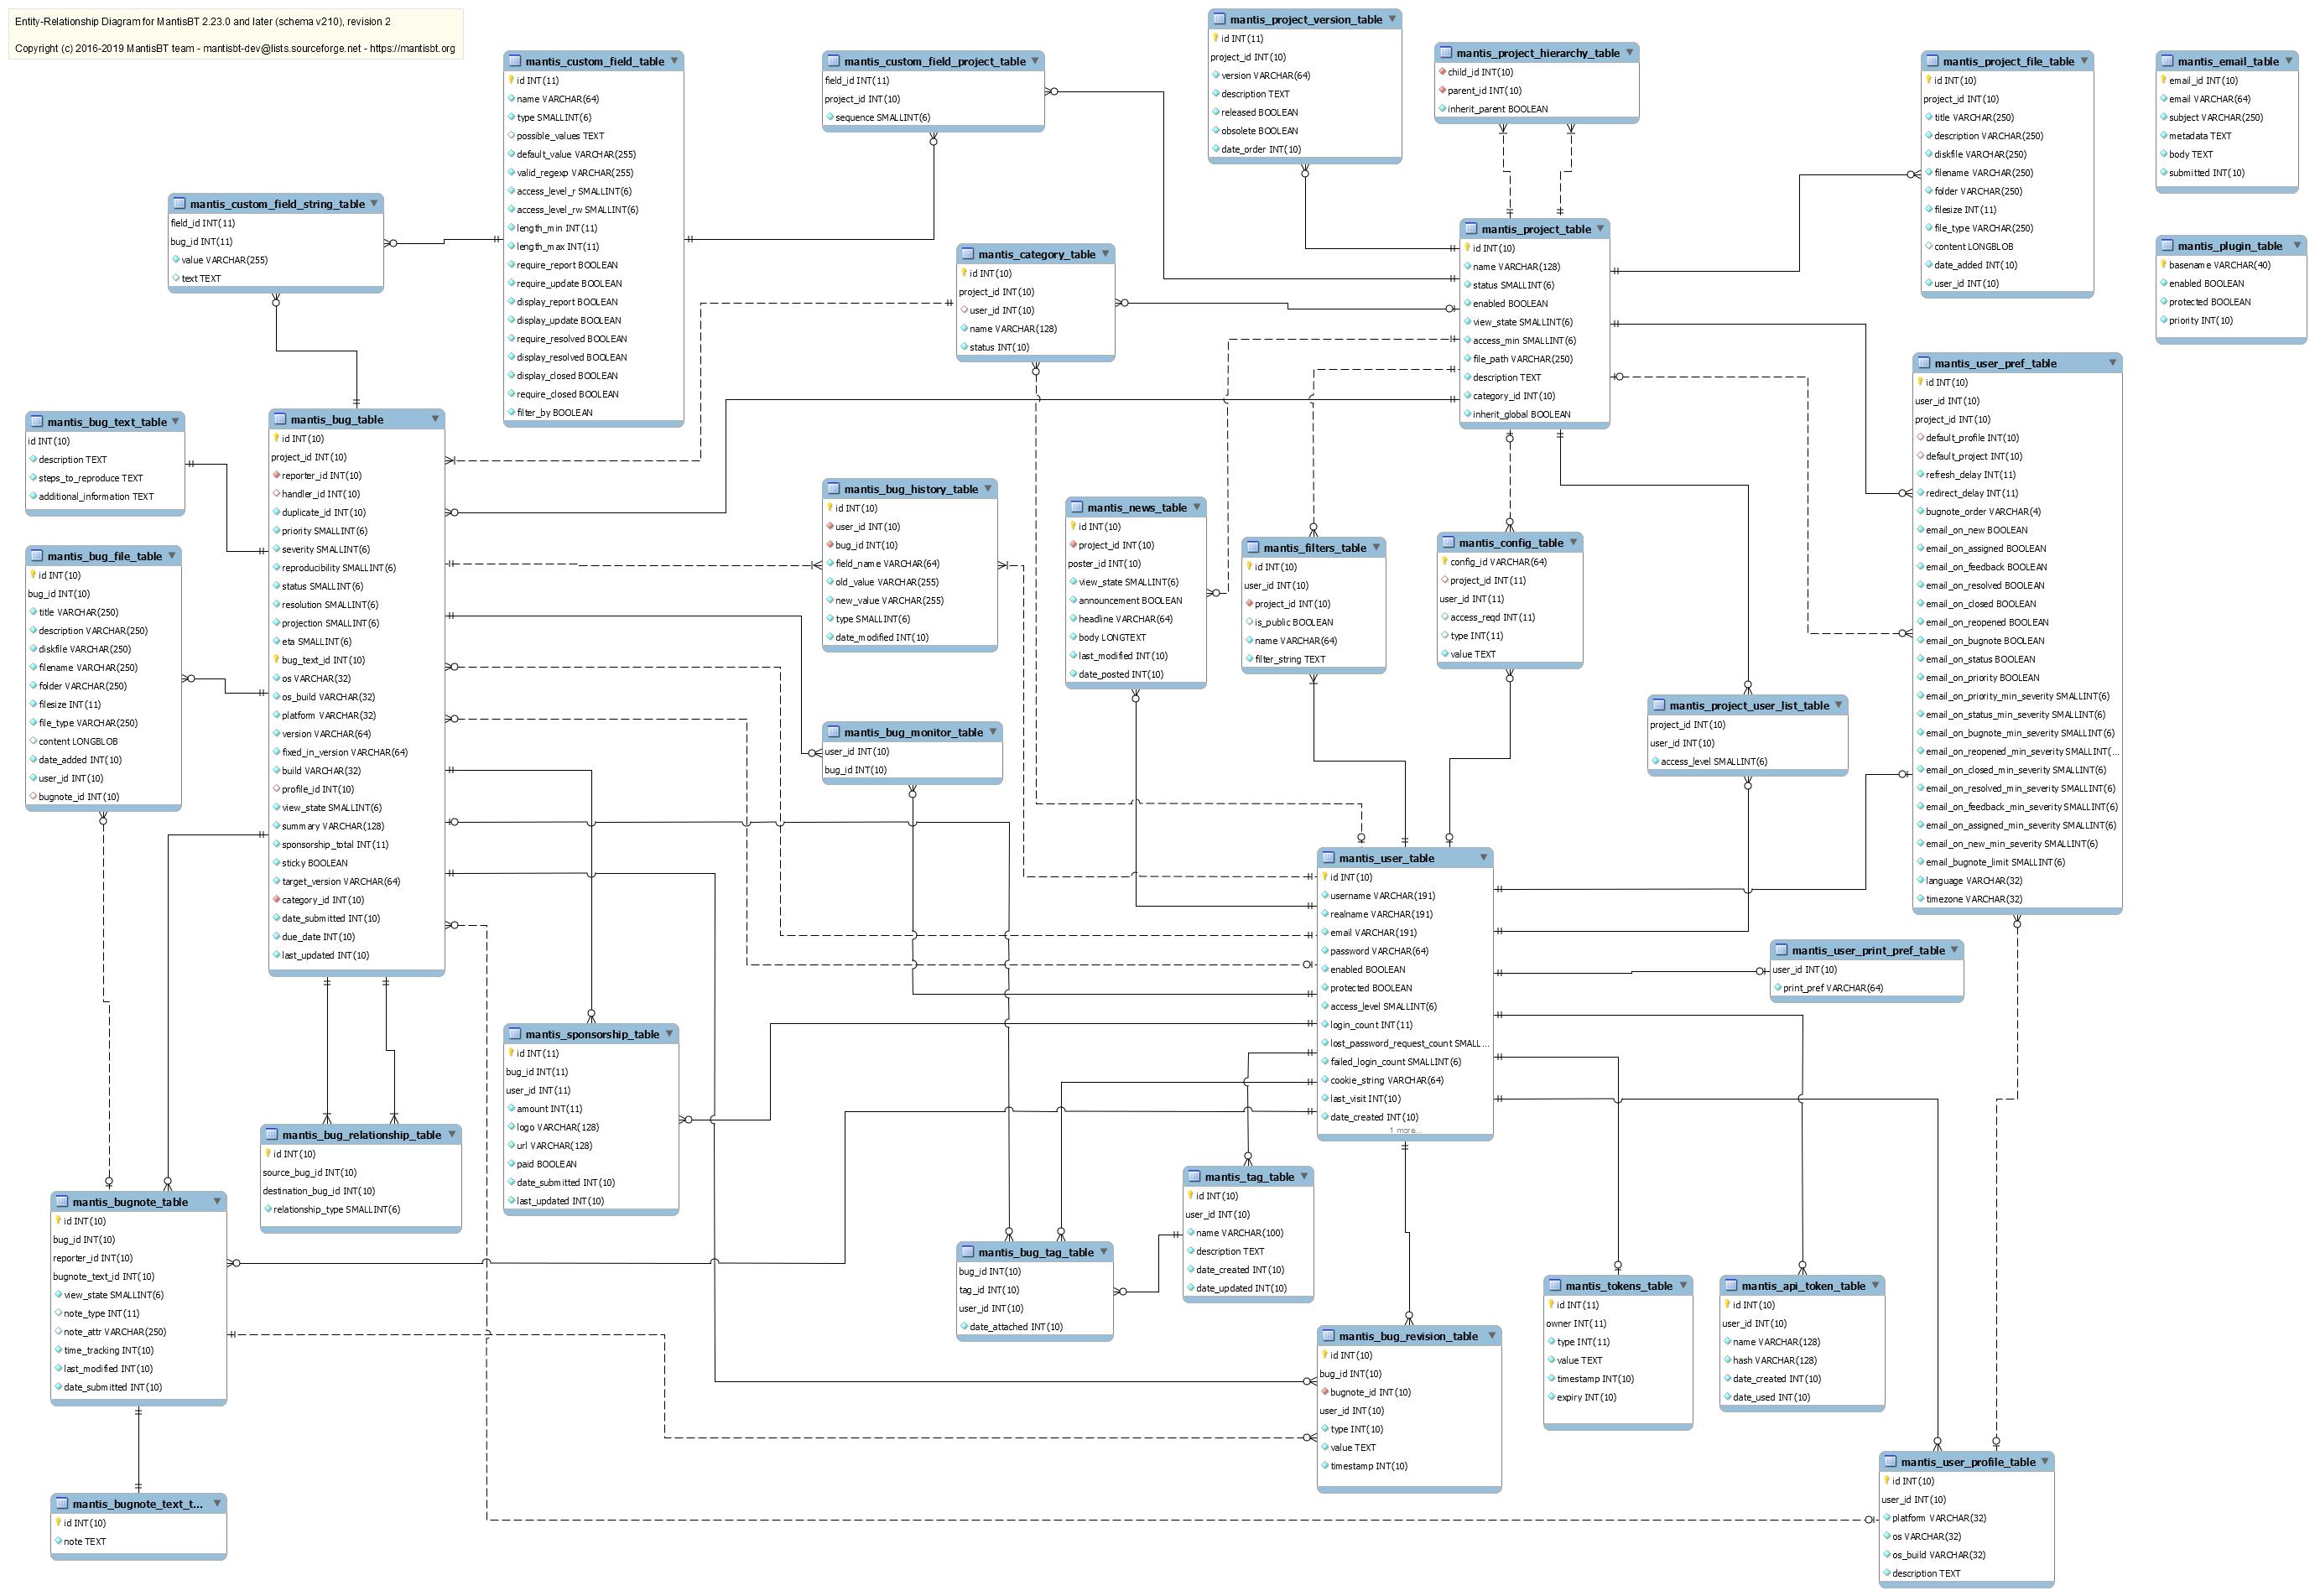 Chapter 2 database schema management mantisbt entity relationship diagram ccuart Gallery